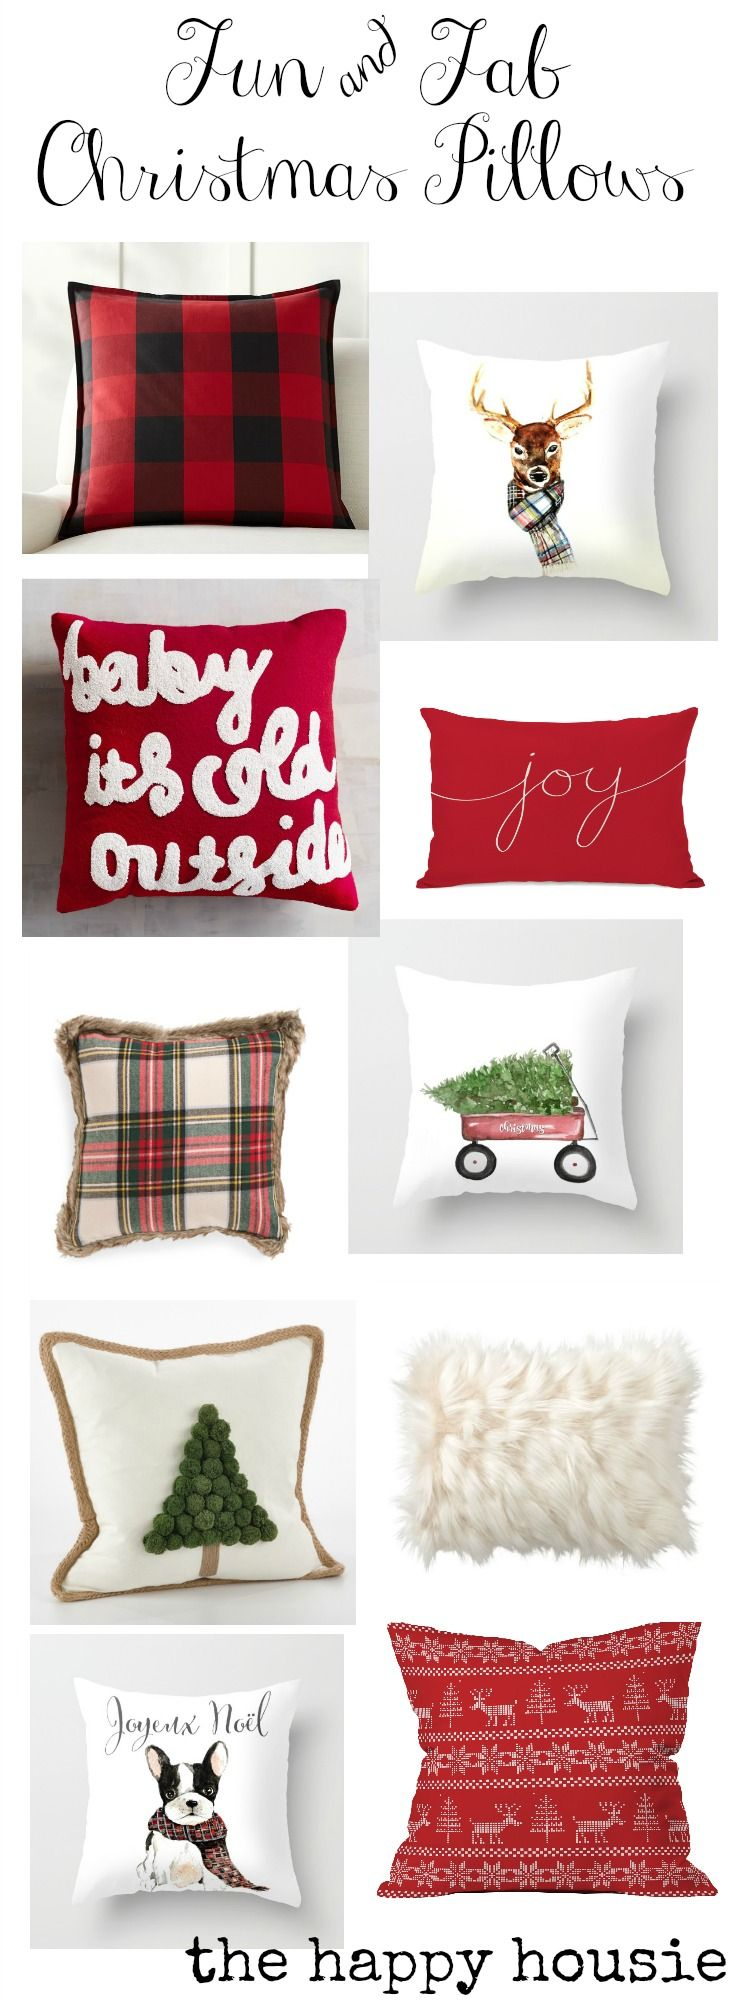 Friday\u0027s Finds: Fun \u0026 Fab Christmas Pillows